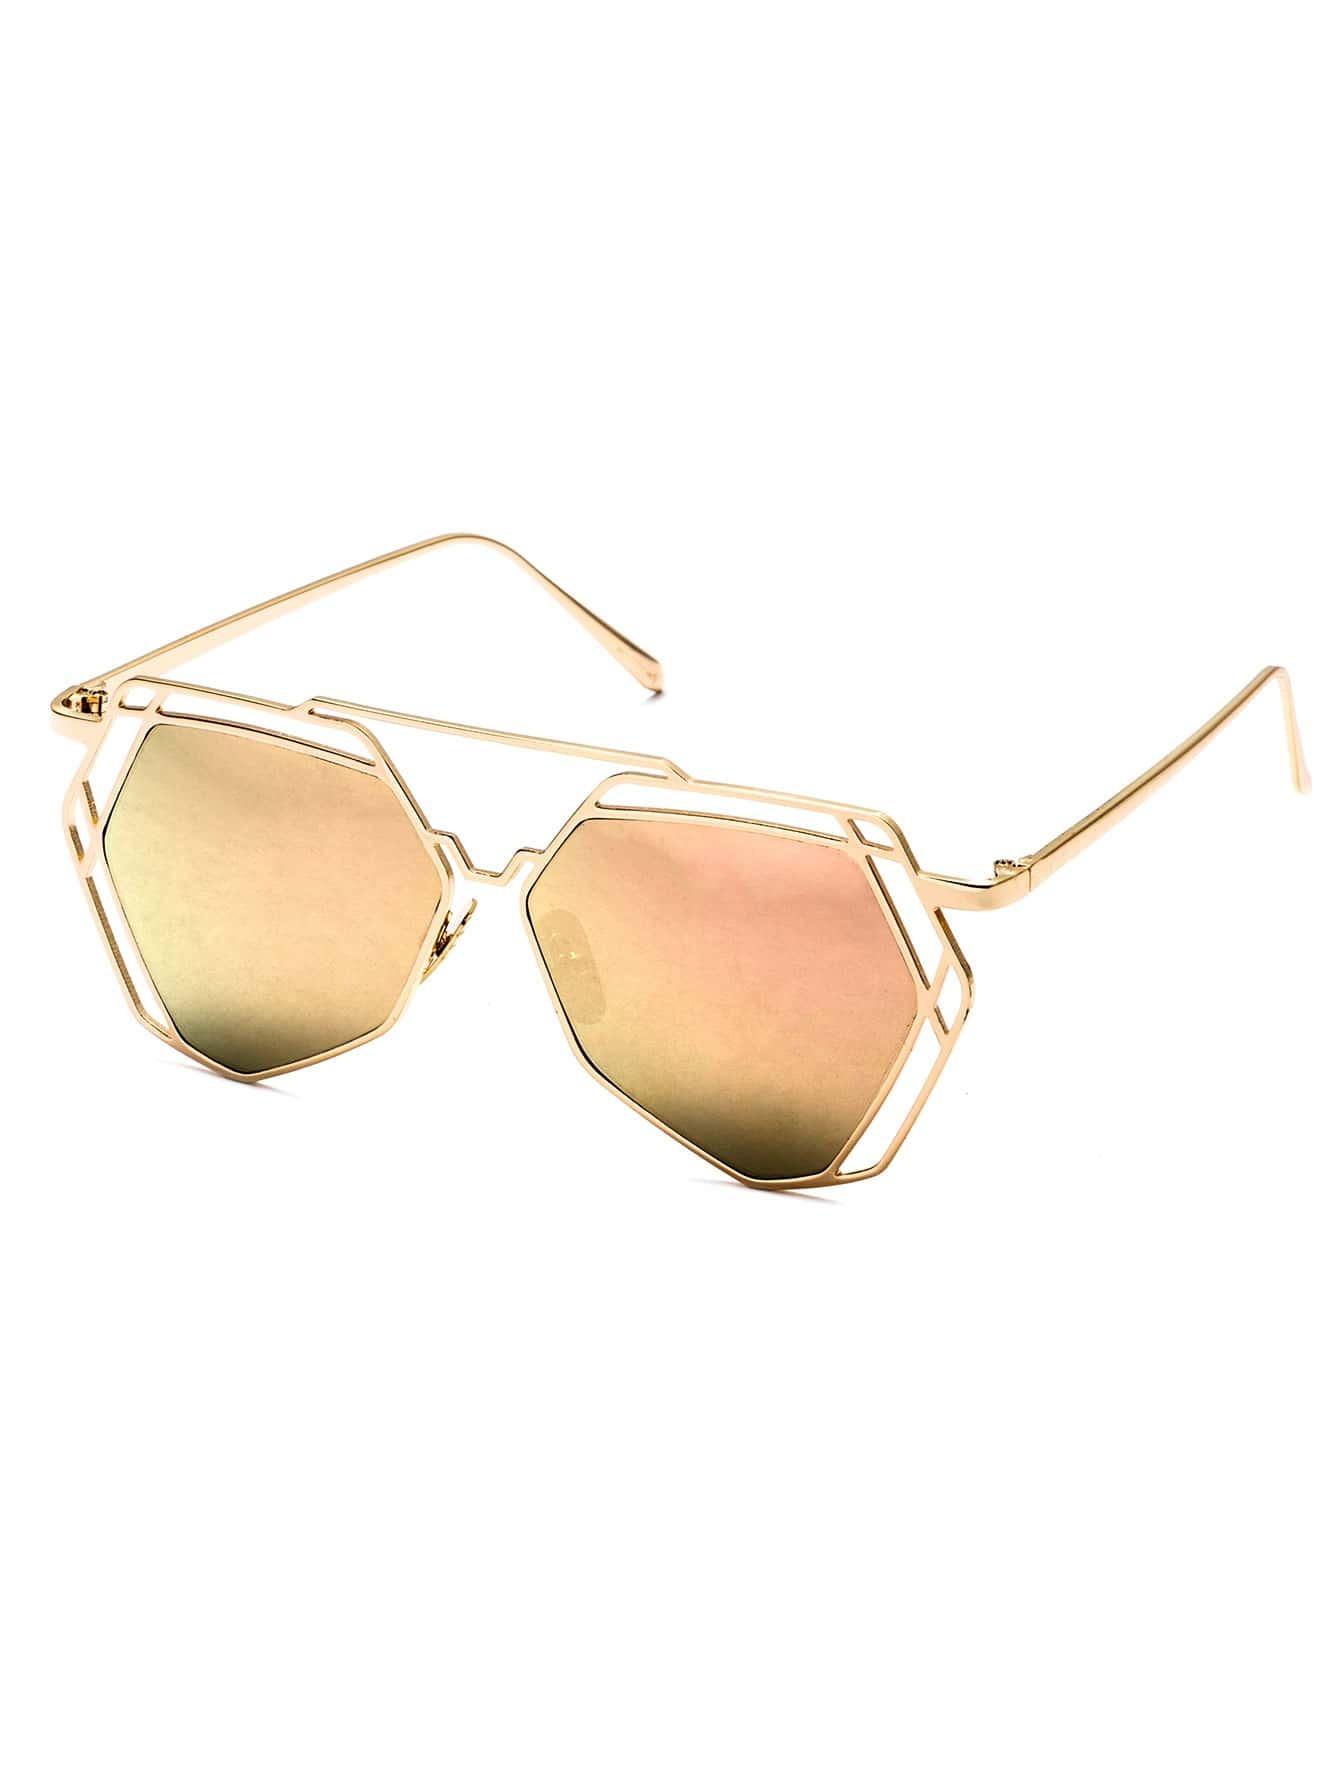 Gold Geometric Hollow Frame Mirrored Sunglasses